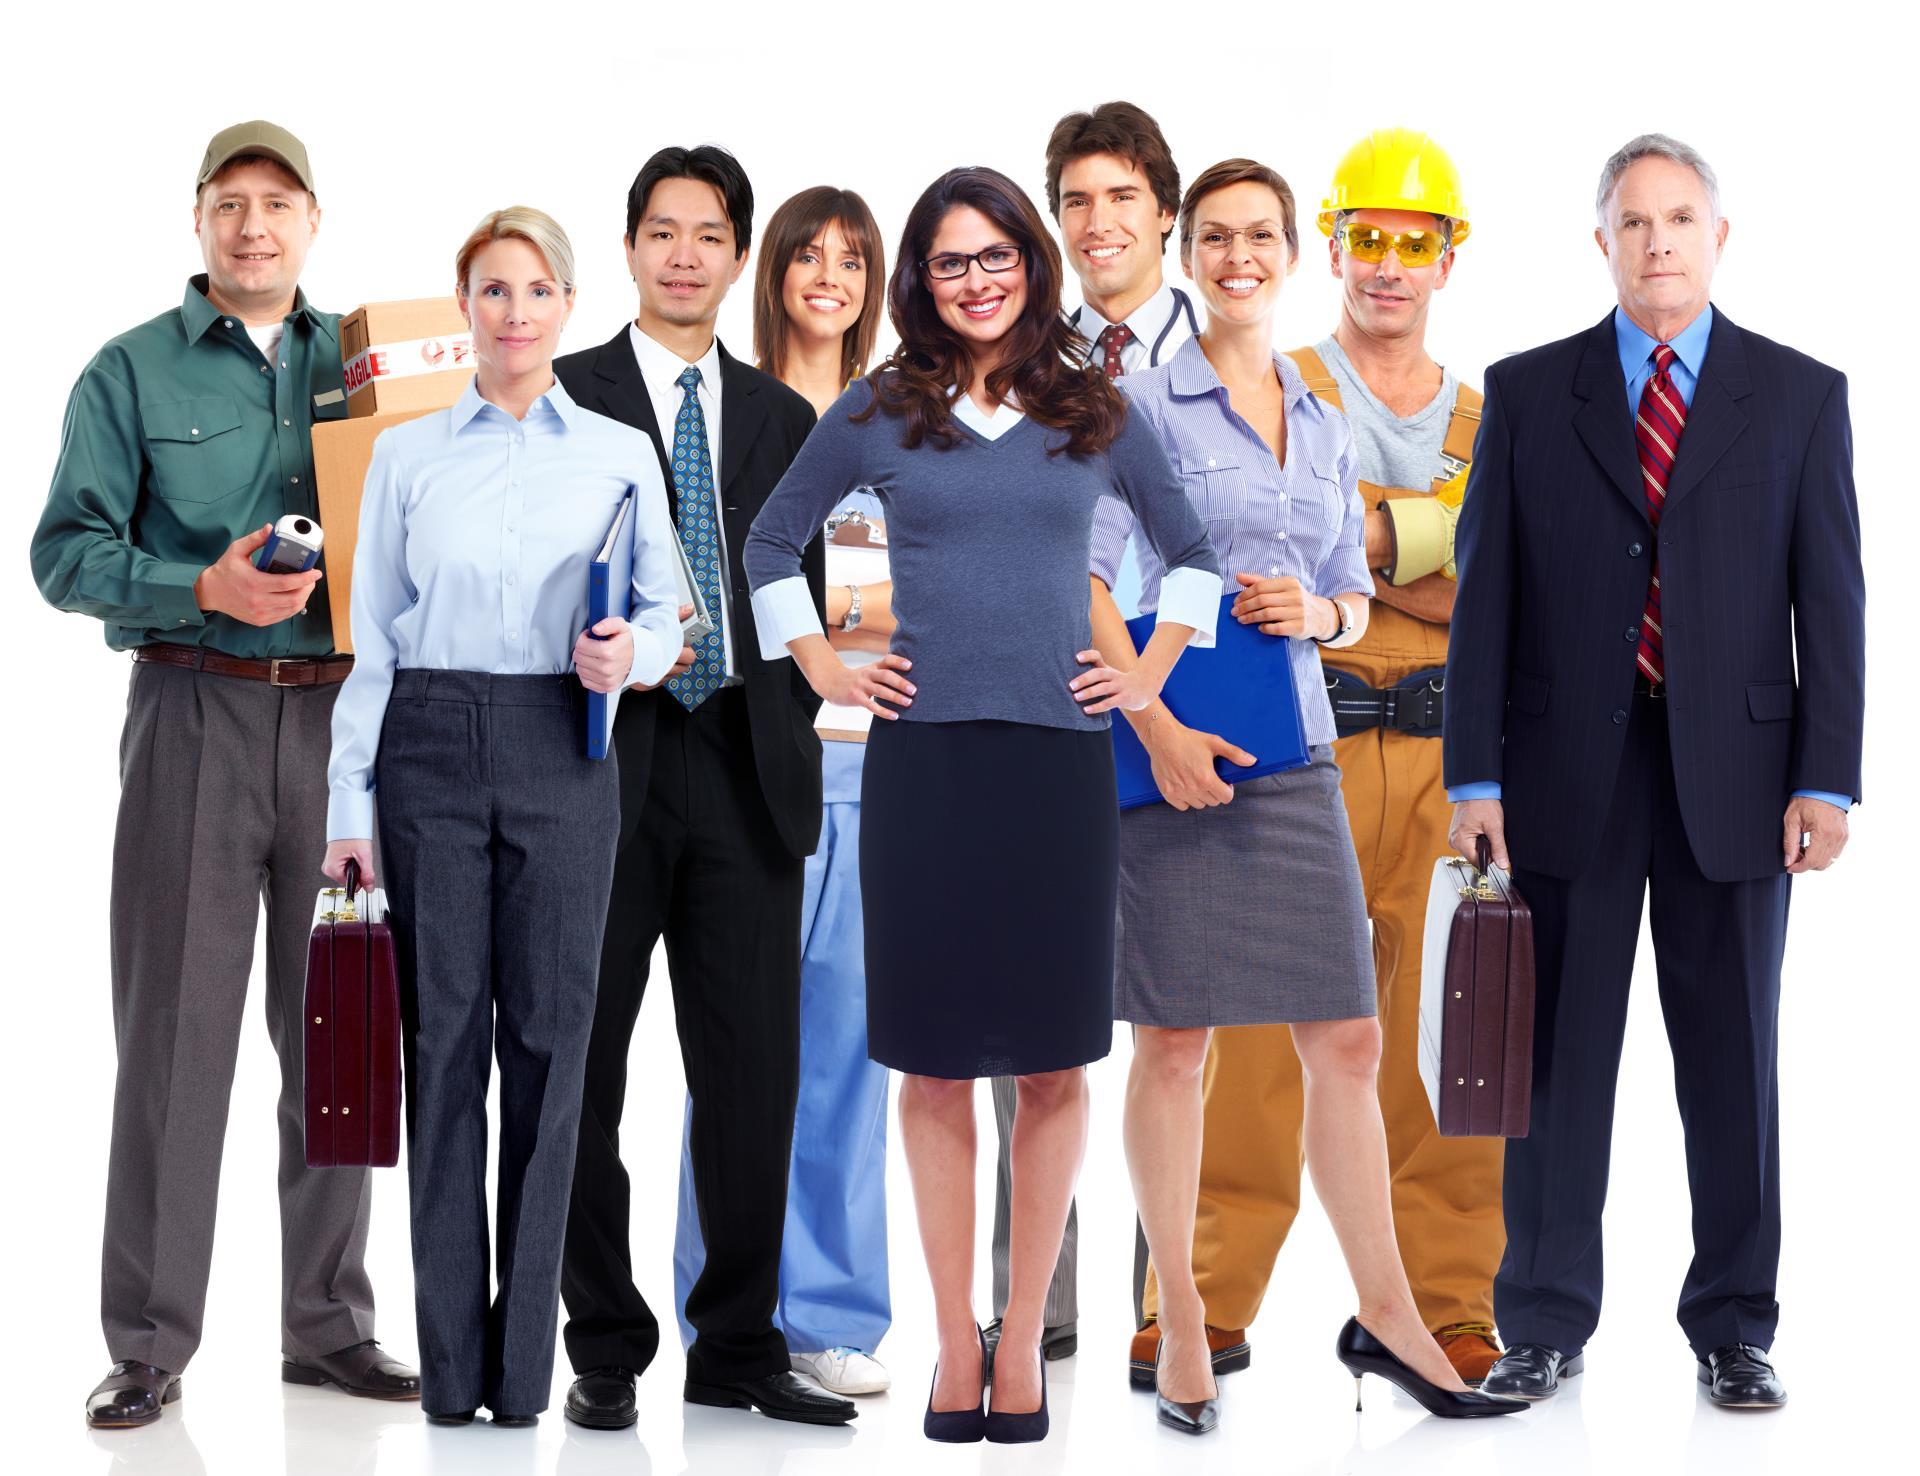 new employee orientation program carson city